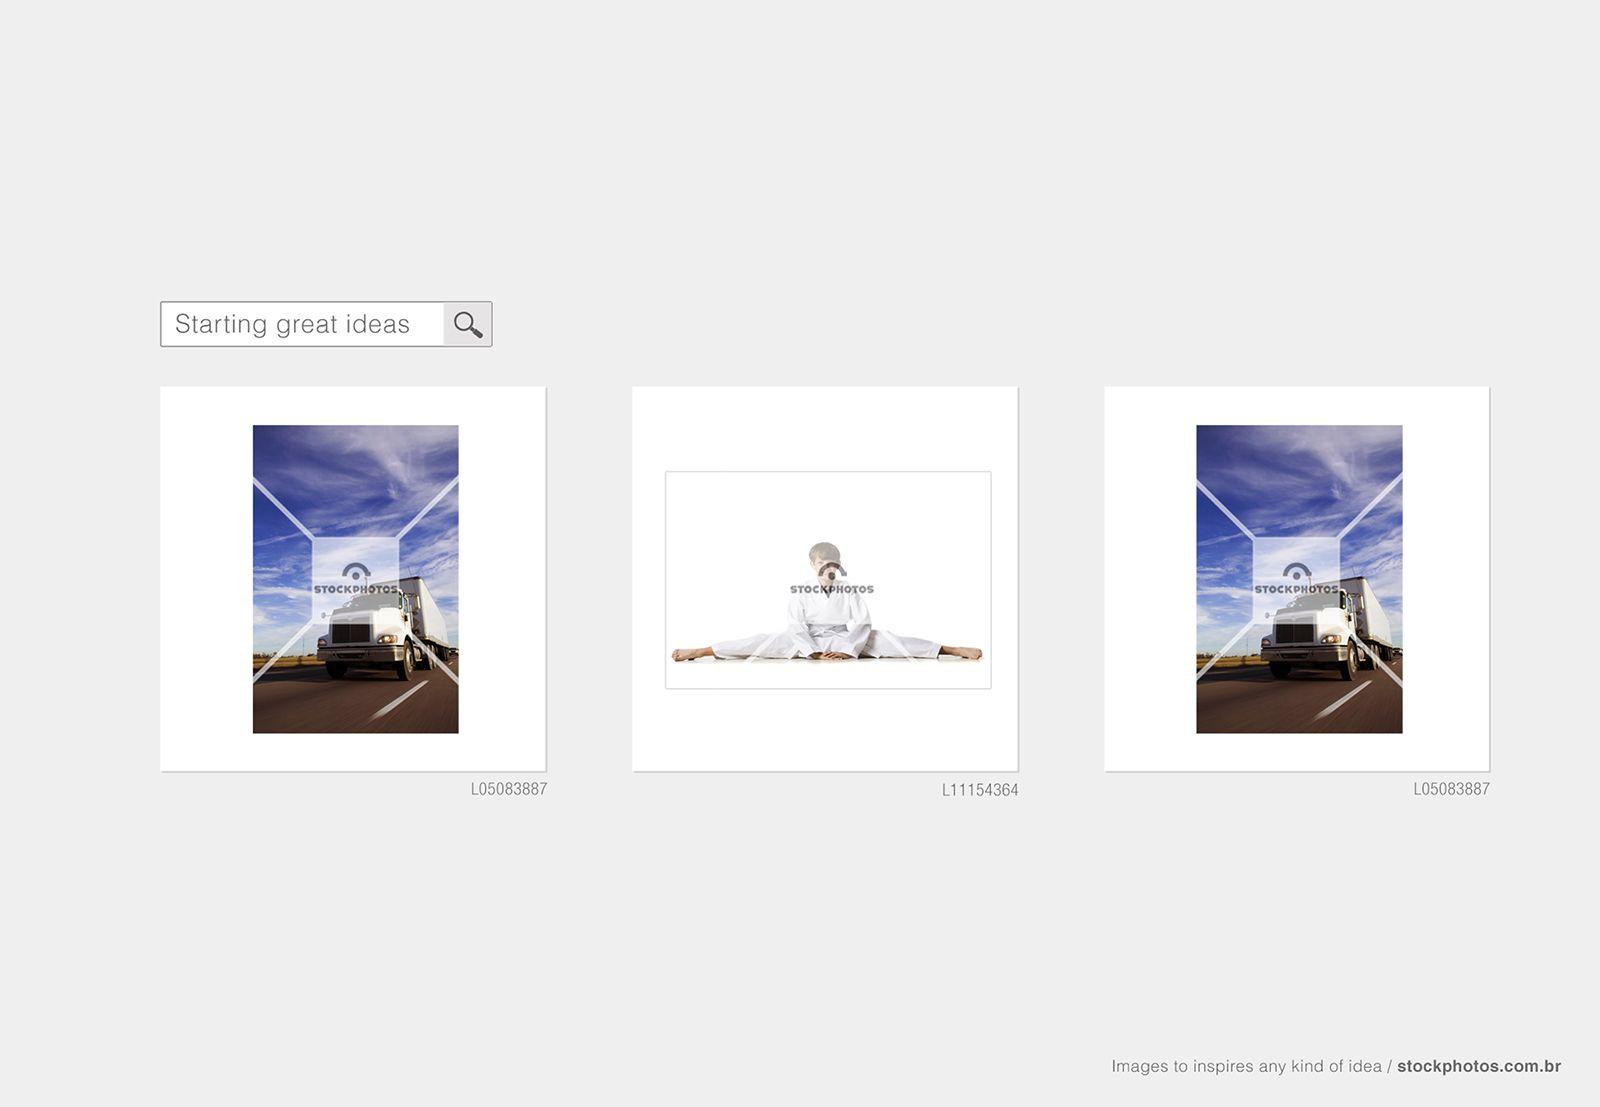 Adeevee - Stock Photos Image Bank: Starting Great Ideas